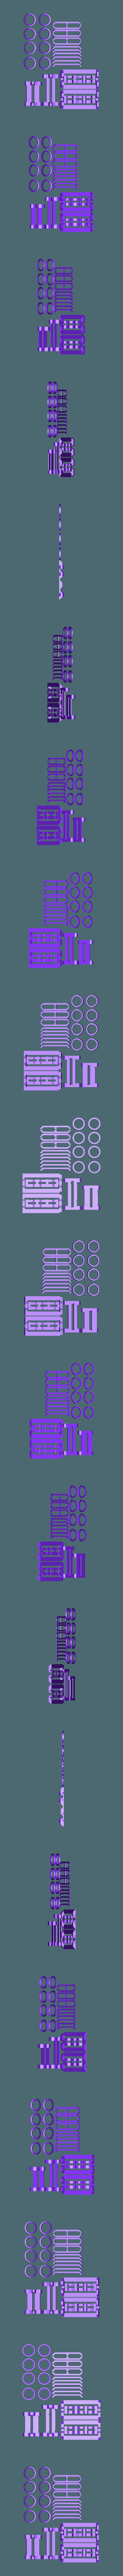 diesel01c_part15.stl Download STL file Diesel-01-C locomotive - ERS and others compatibile, FDM 3D printable • 3D printer object, euroreprap_eu